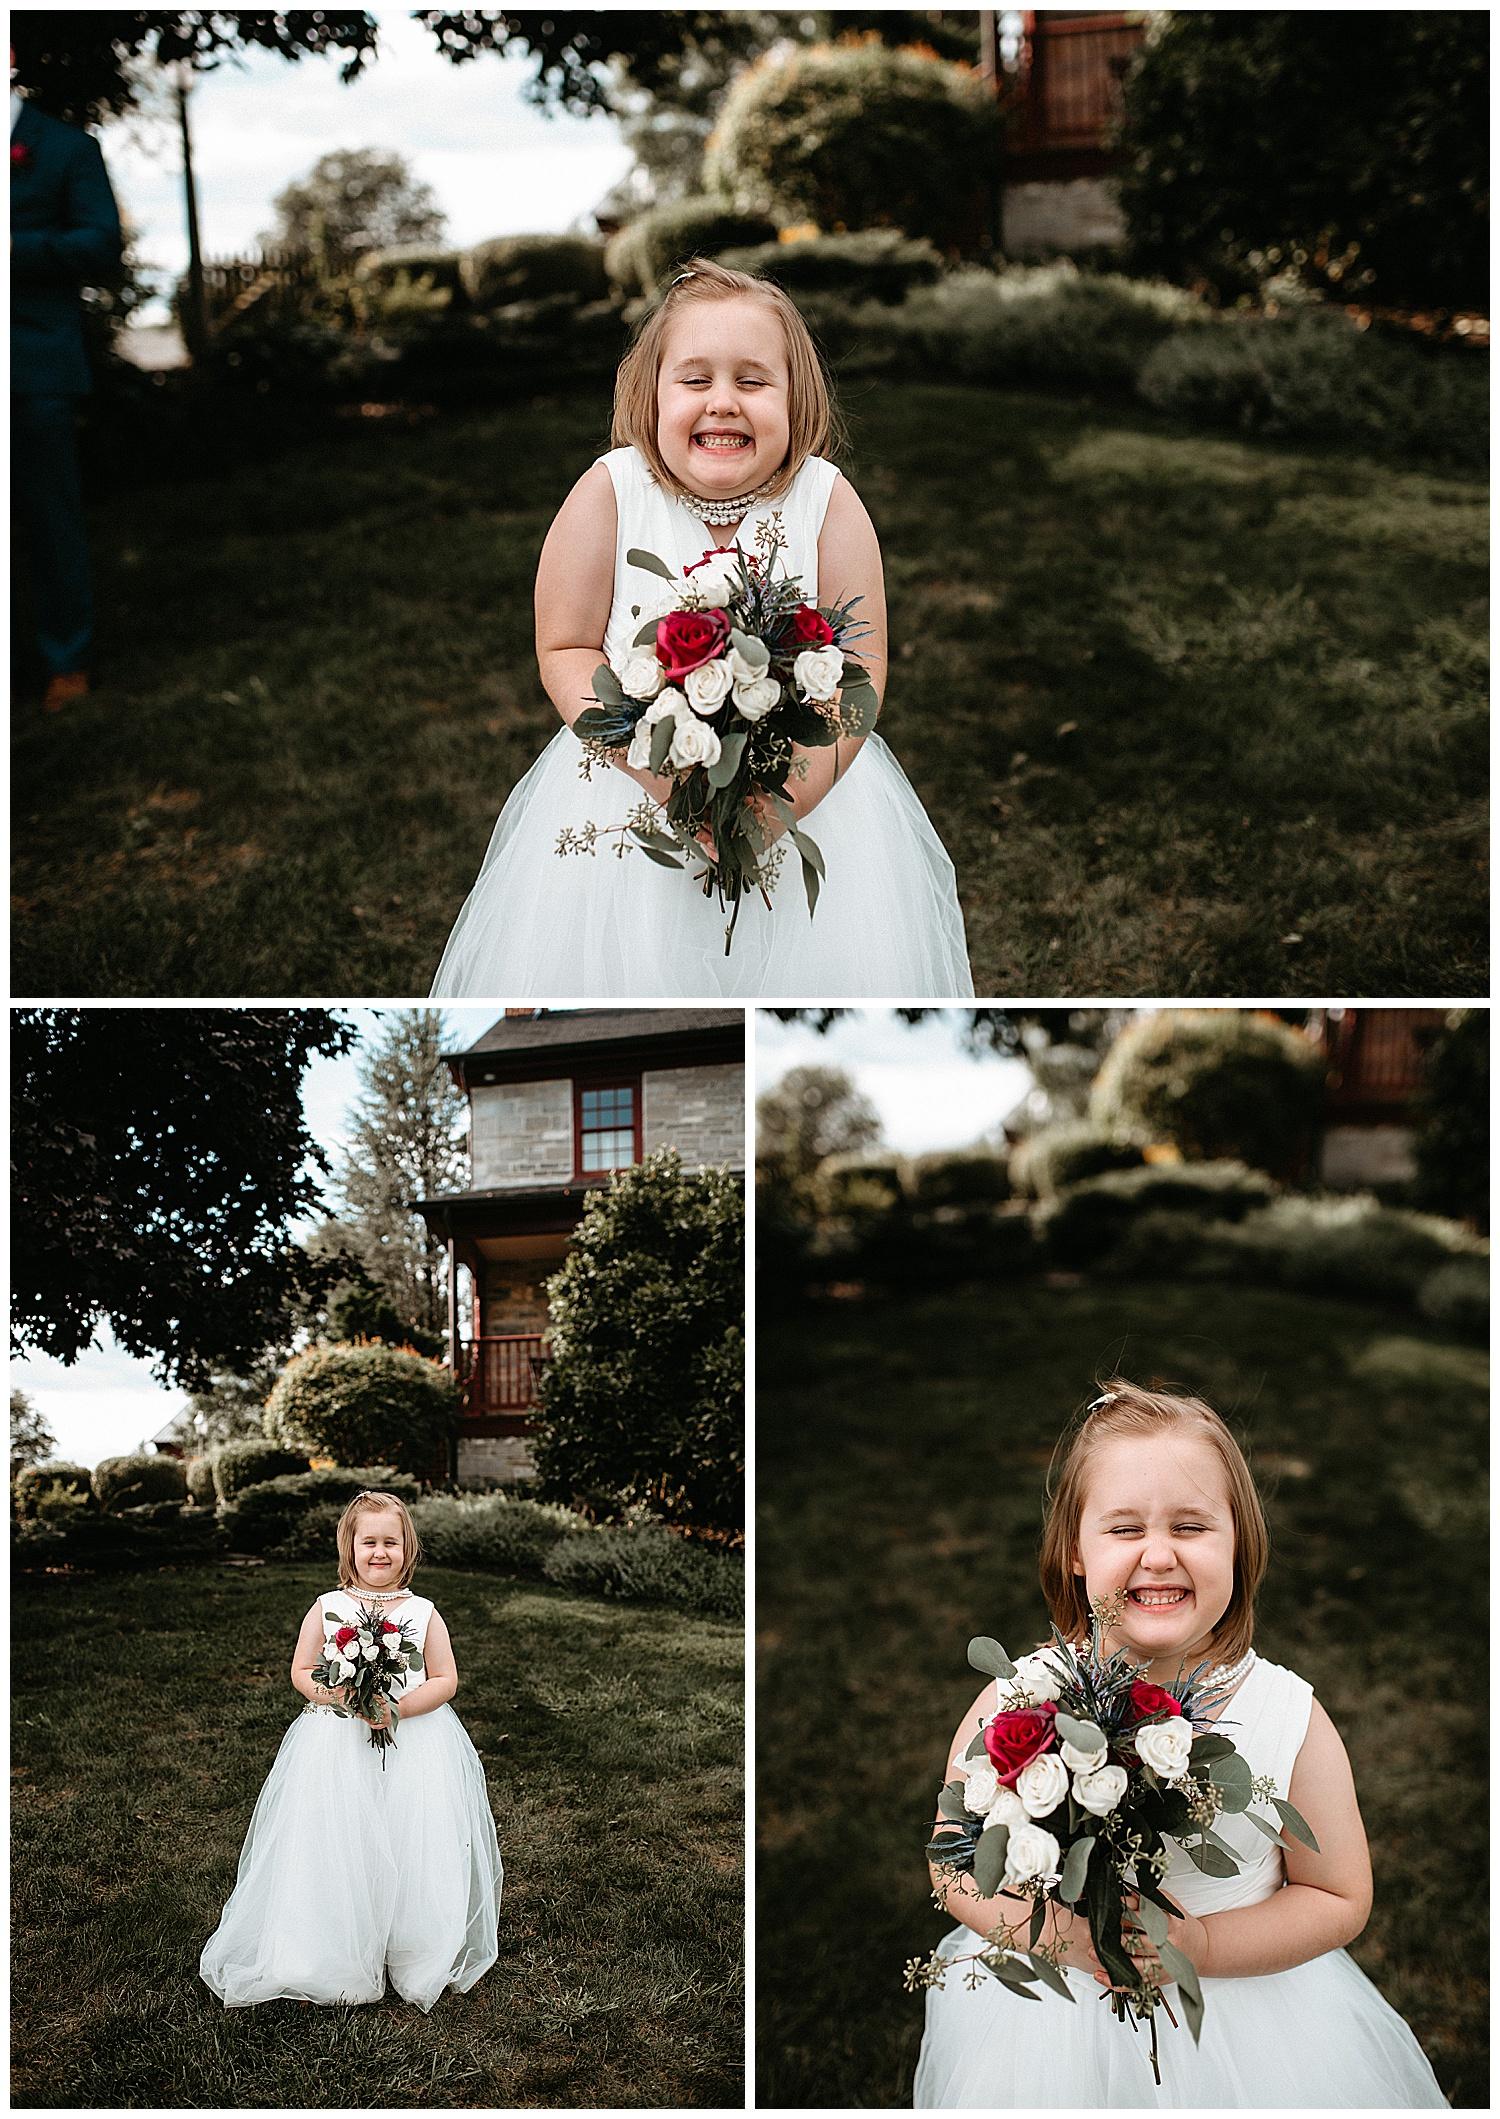 NEPA-Bloomgsburg-Wedding-Photographer-at-The-Barn-at-Greystone-Farms-Watsontown-PA_0082.jpg